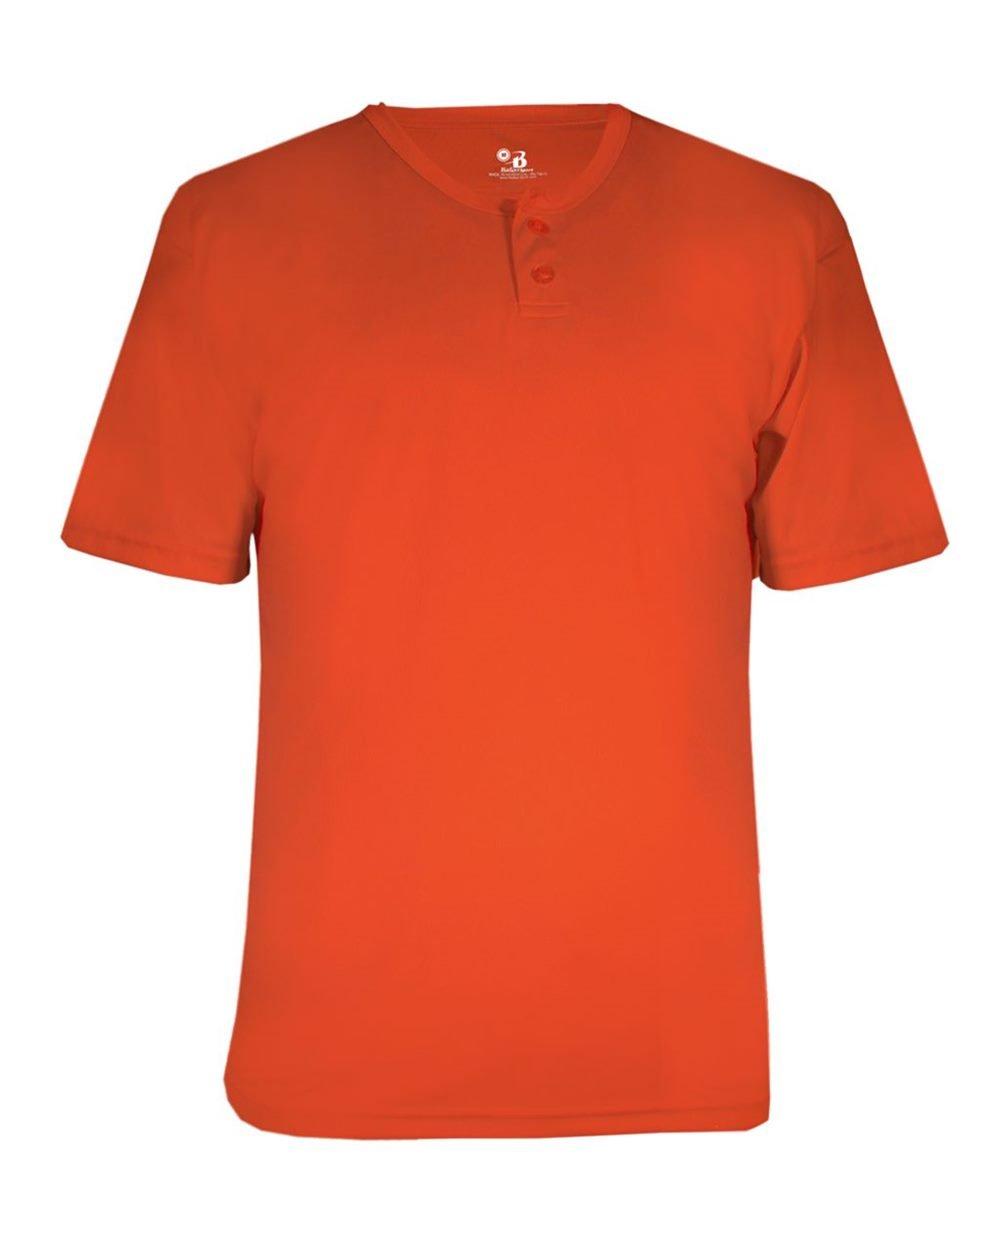 Badger b7930 BD ADT b-dry Core Plkt T B004OBNJVS 4L オレンジ(Burnt orange) オレンジ(Burnt orange) 4L